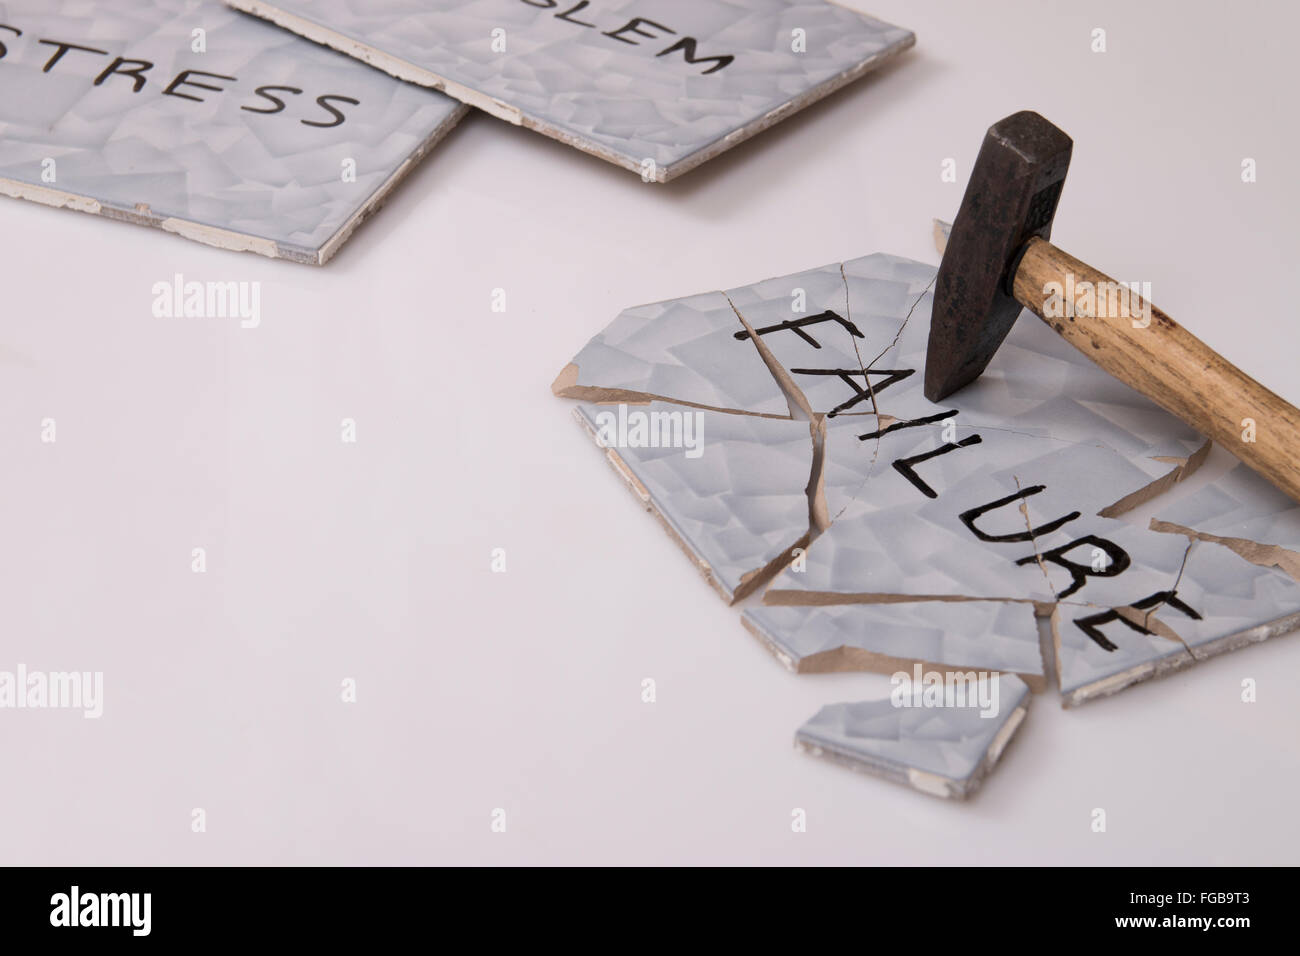 overcome failure and stress - Stock Image